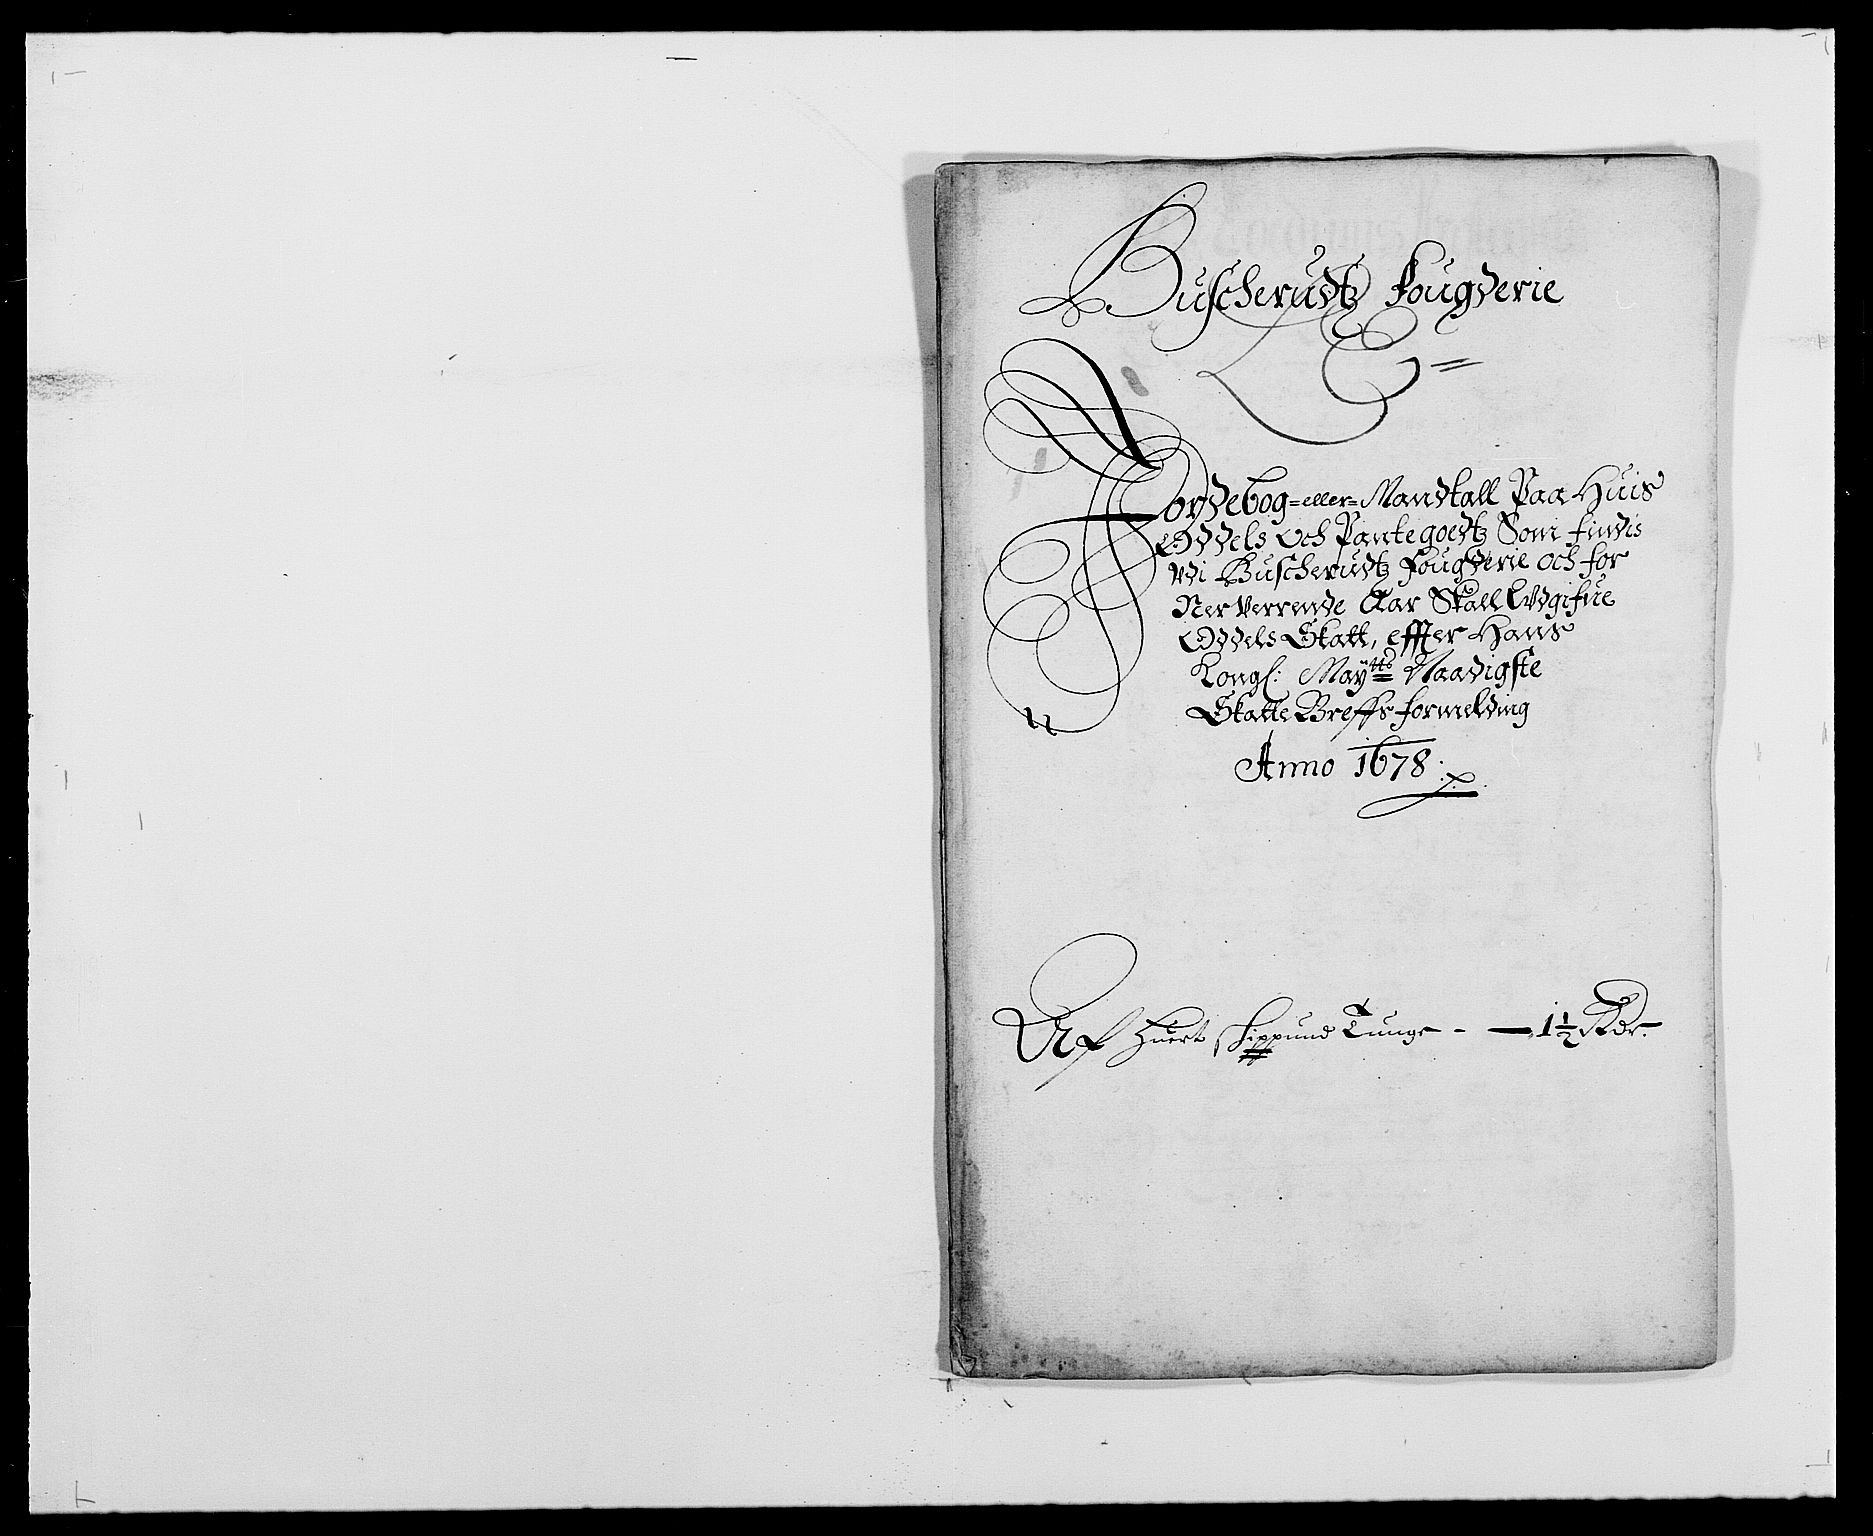 RA, Rentekammeret inntil 1814, Reviderte regnskaper, Fogderegnskap, R25/L1674: Fogderegnskap Buskerud, 1678-1681, s. 123